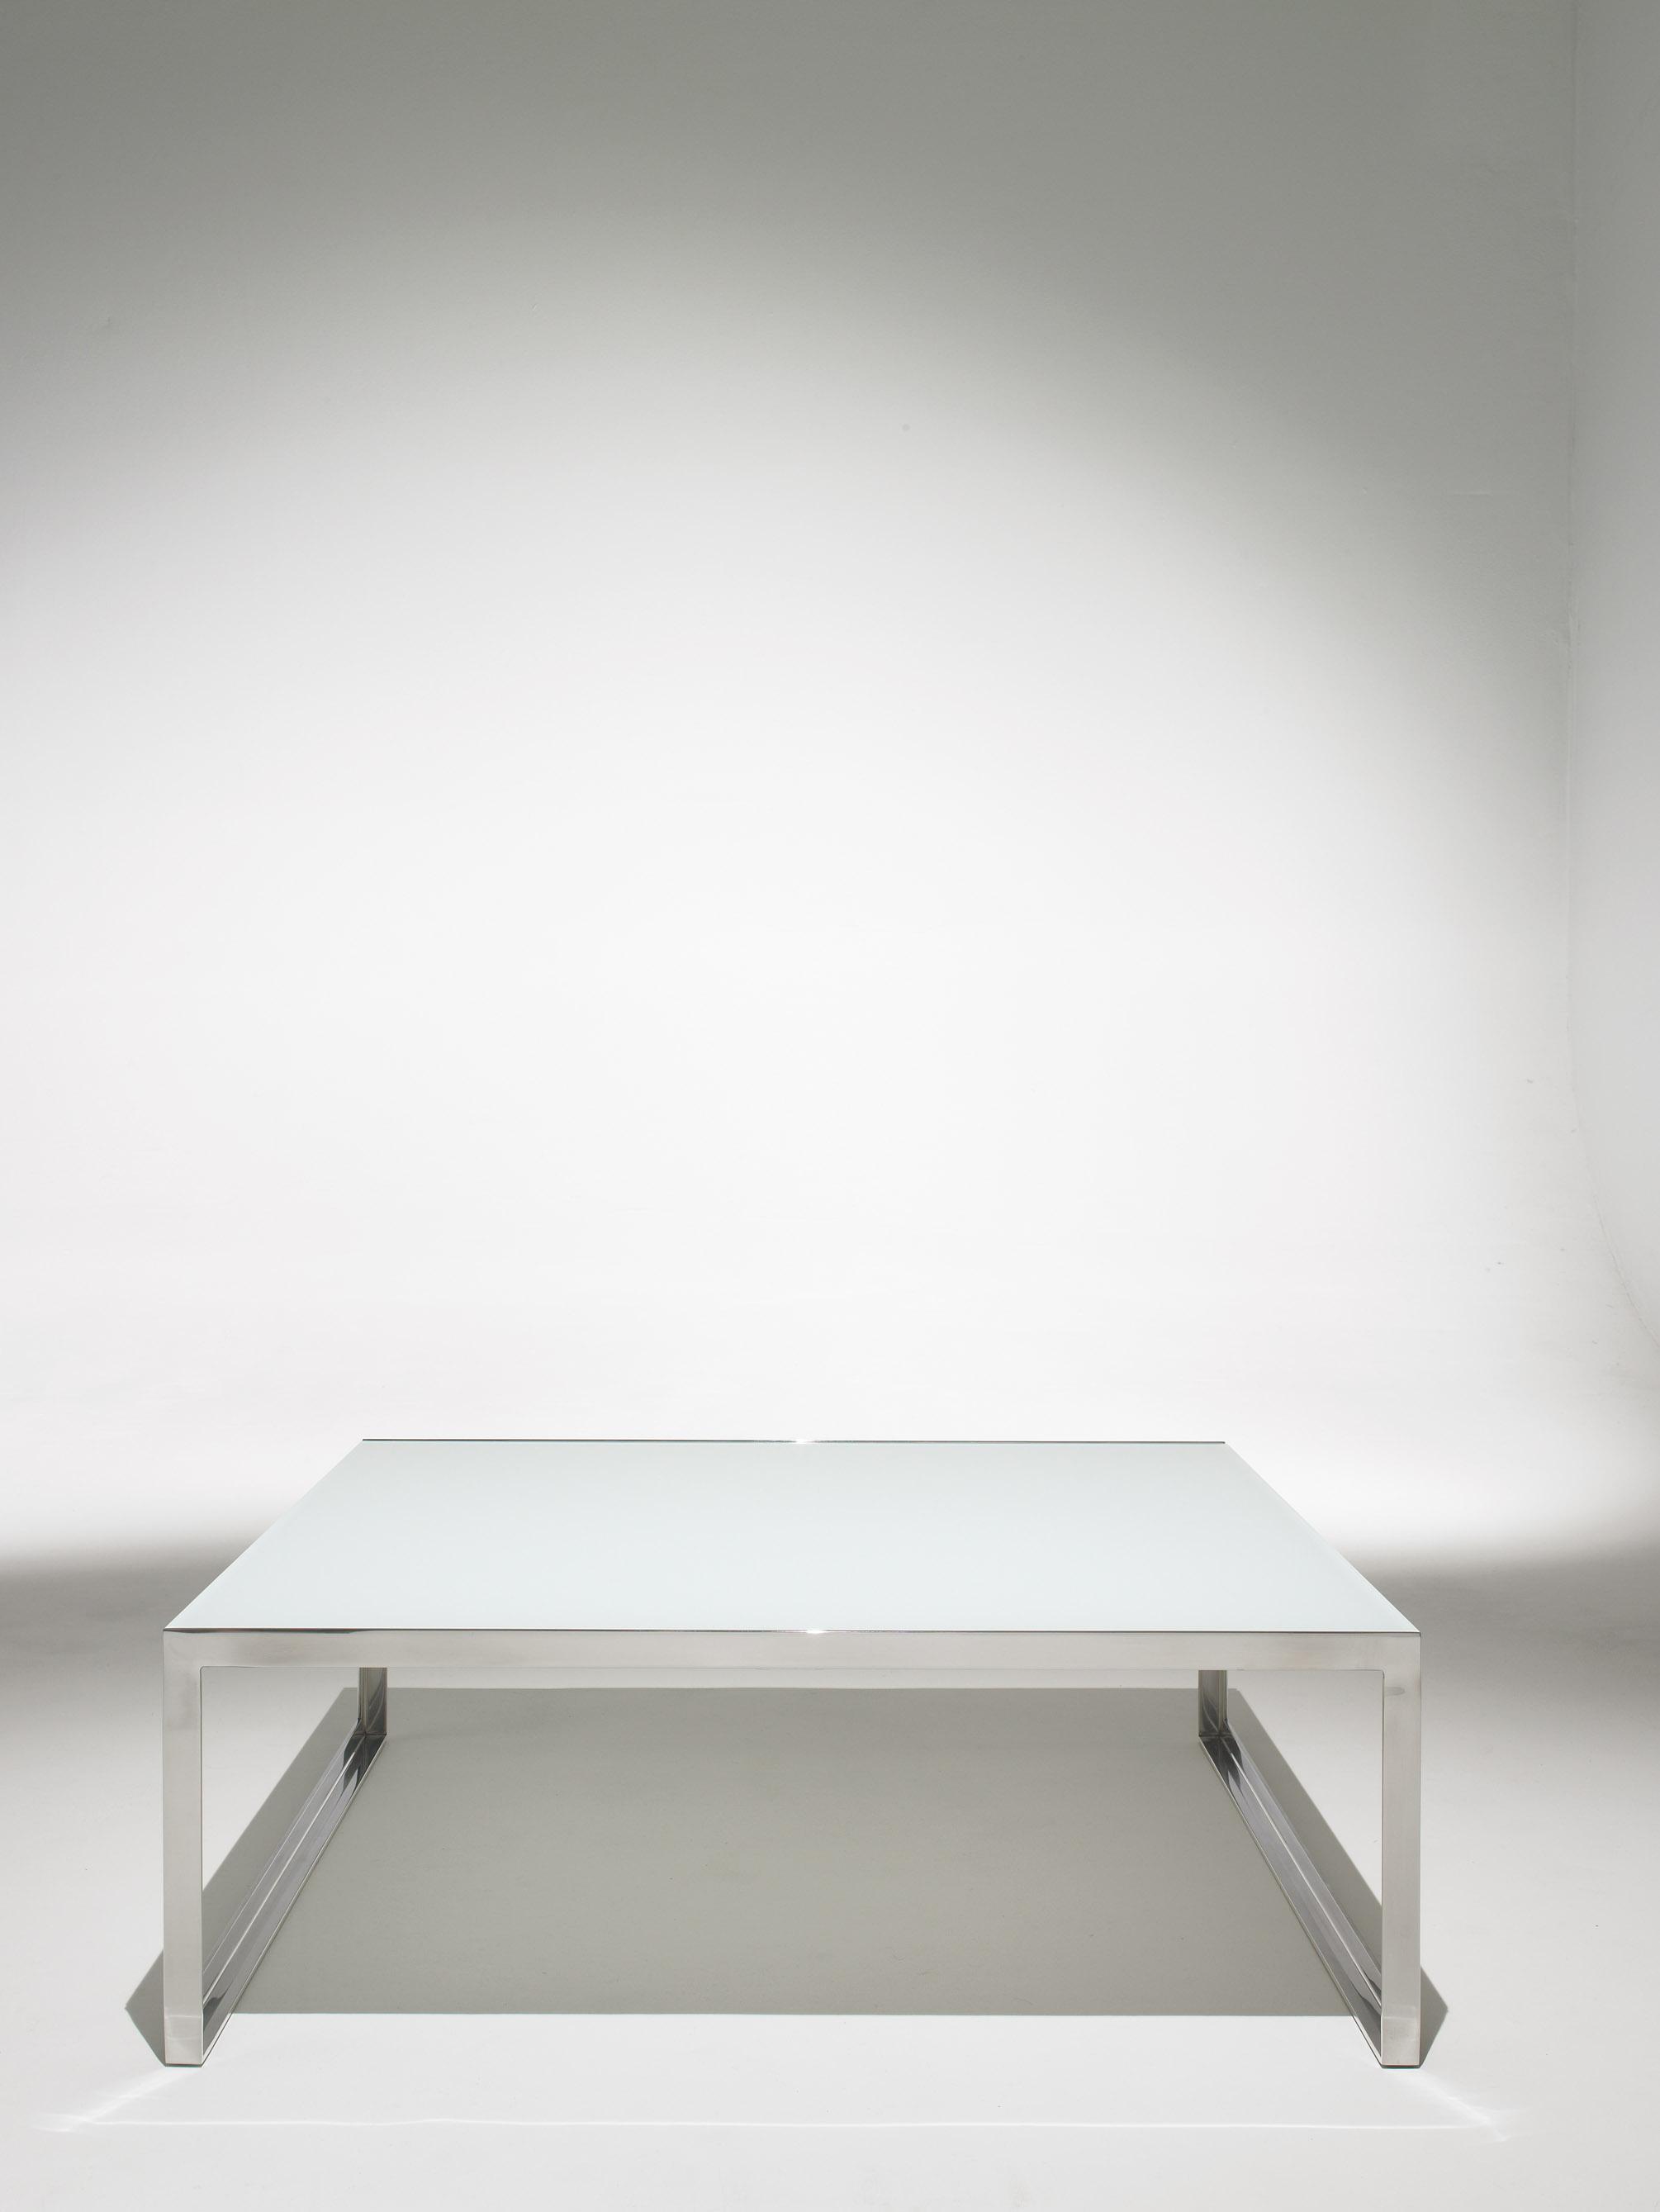 Shelton Mindel SM Coffee Table